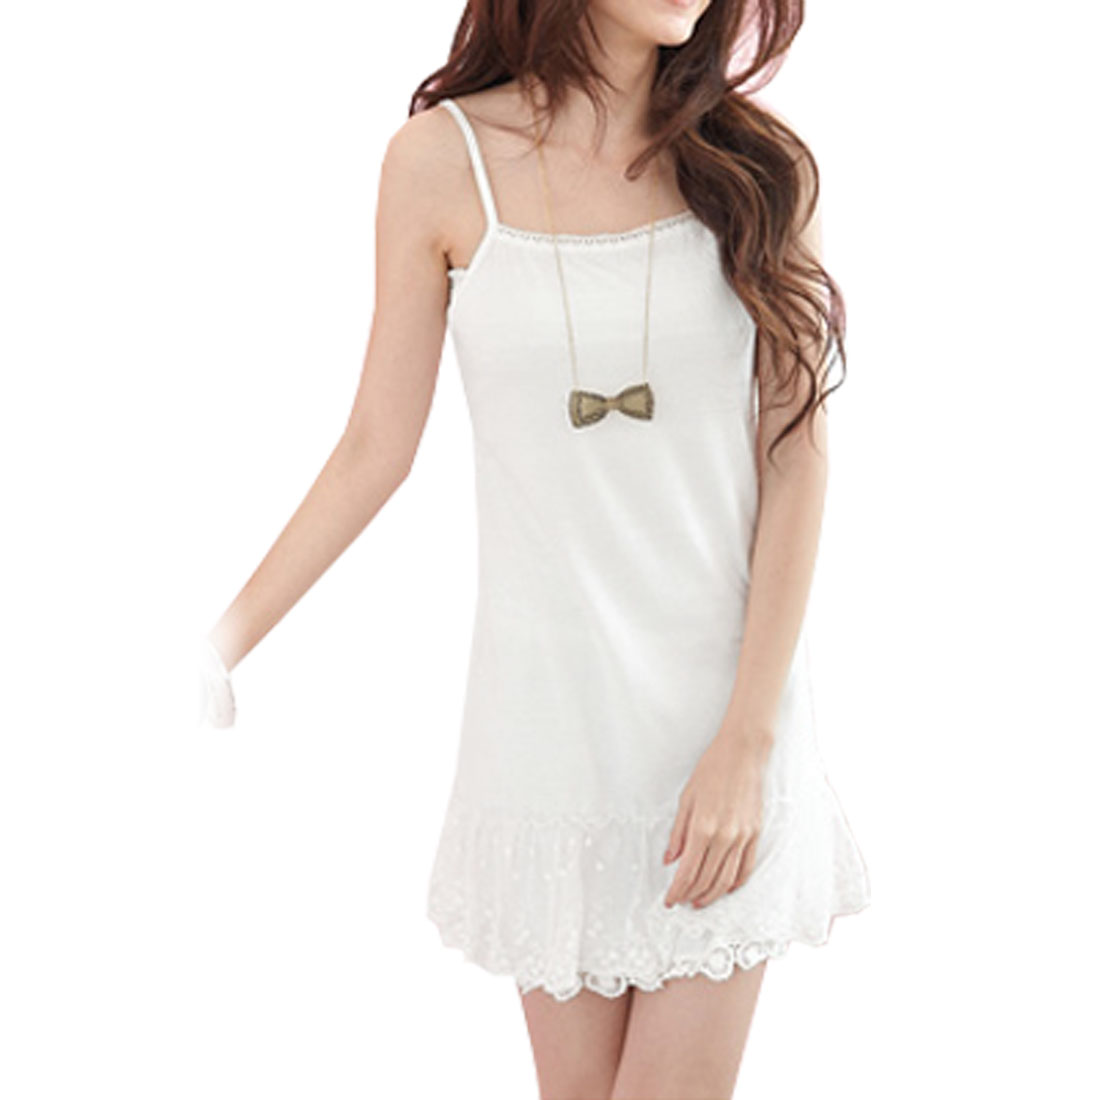 Women Sleeveless Solid White Basic Spaghetti Dress XS